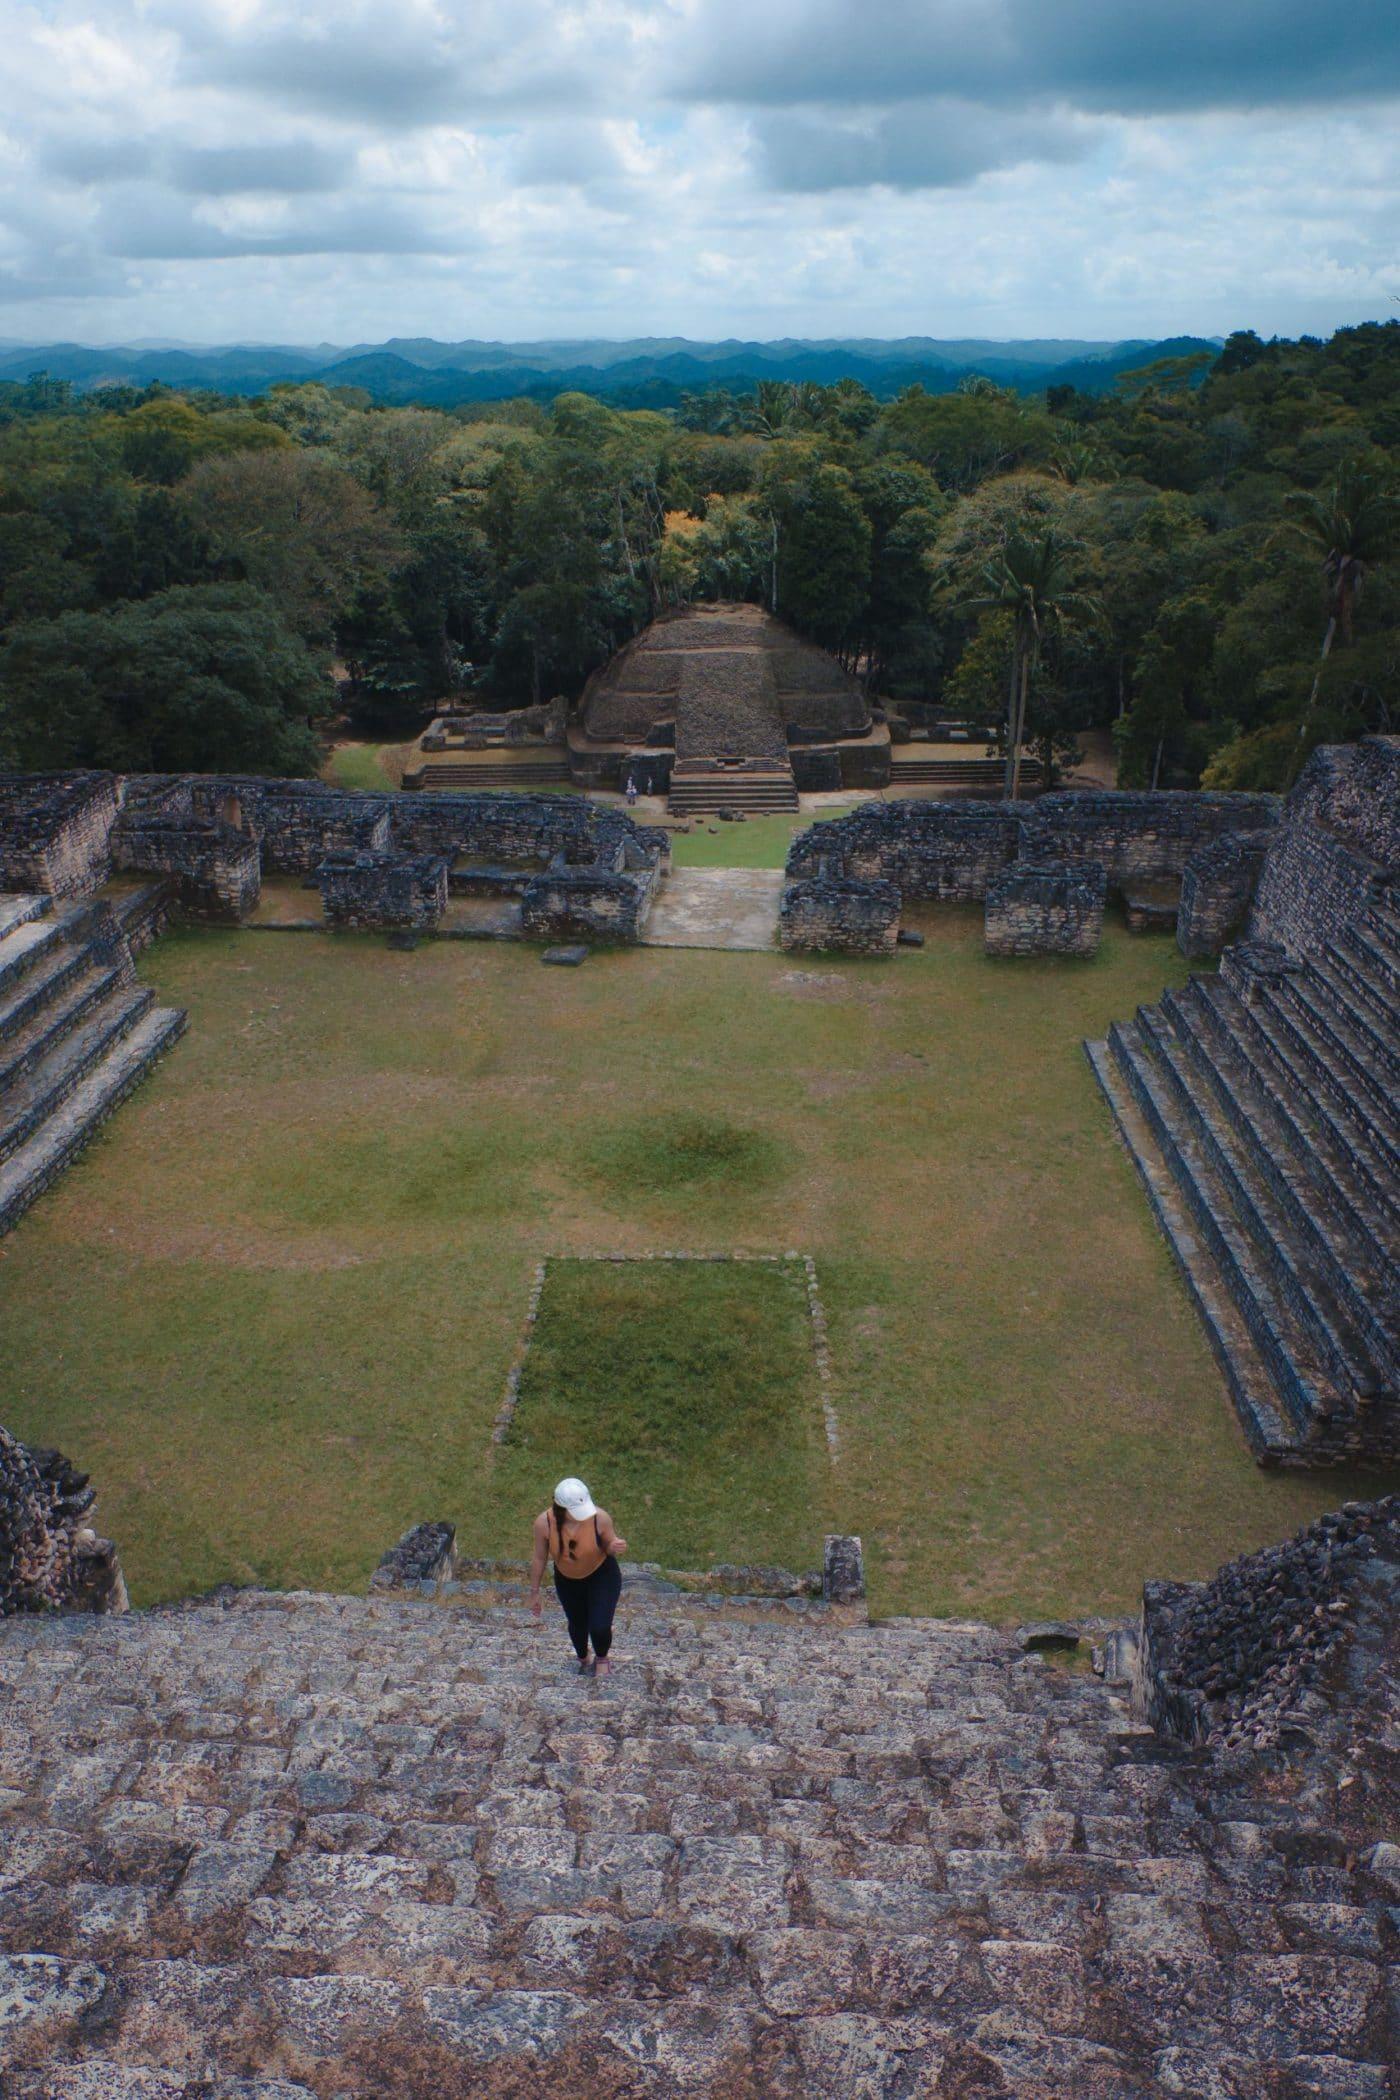 Climbing the stairs of the Mayan ruins at Caracol